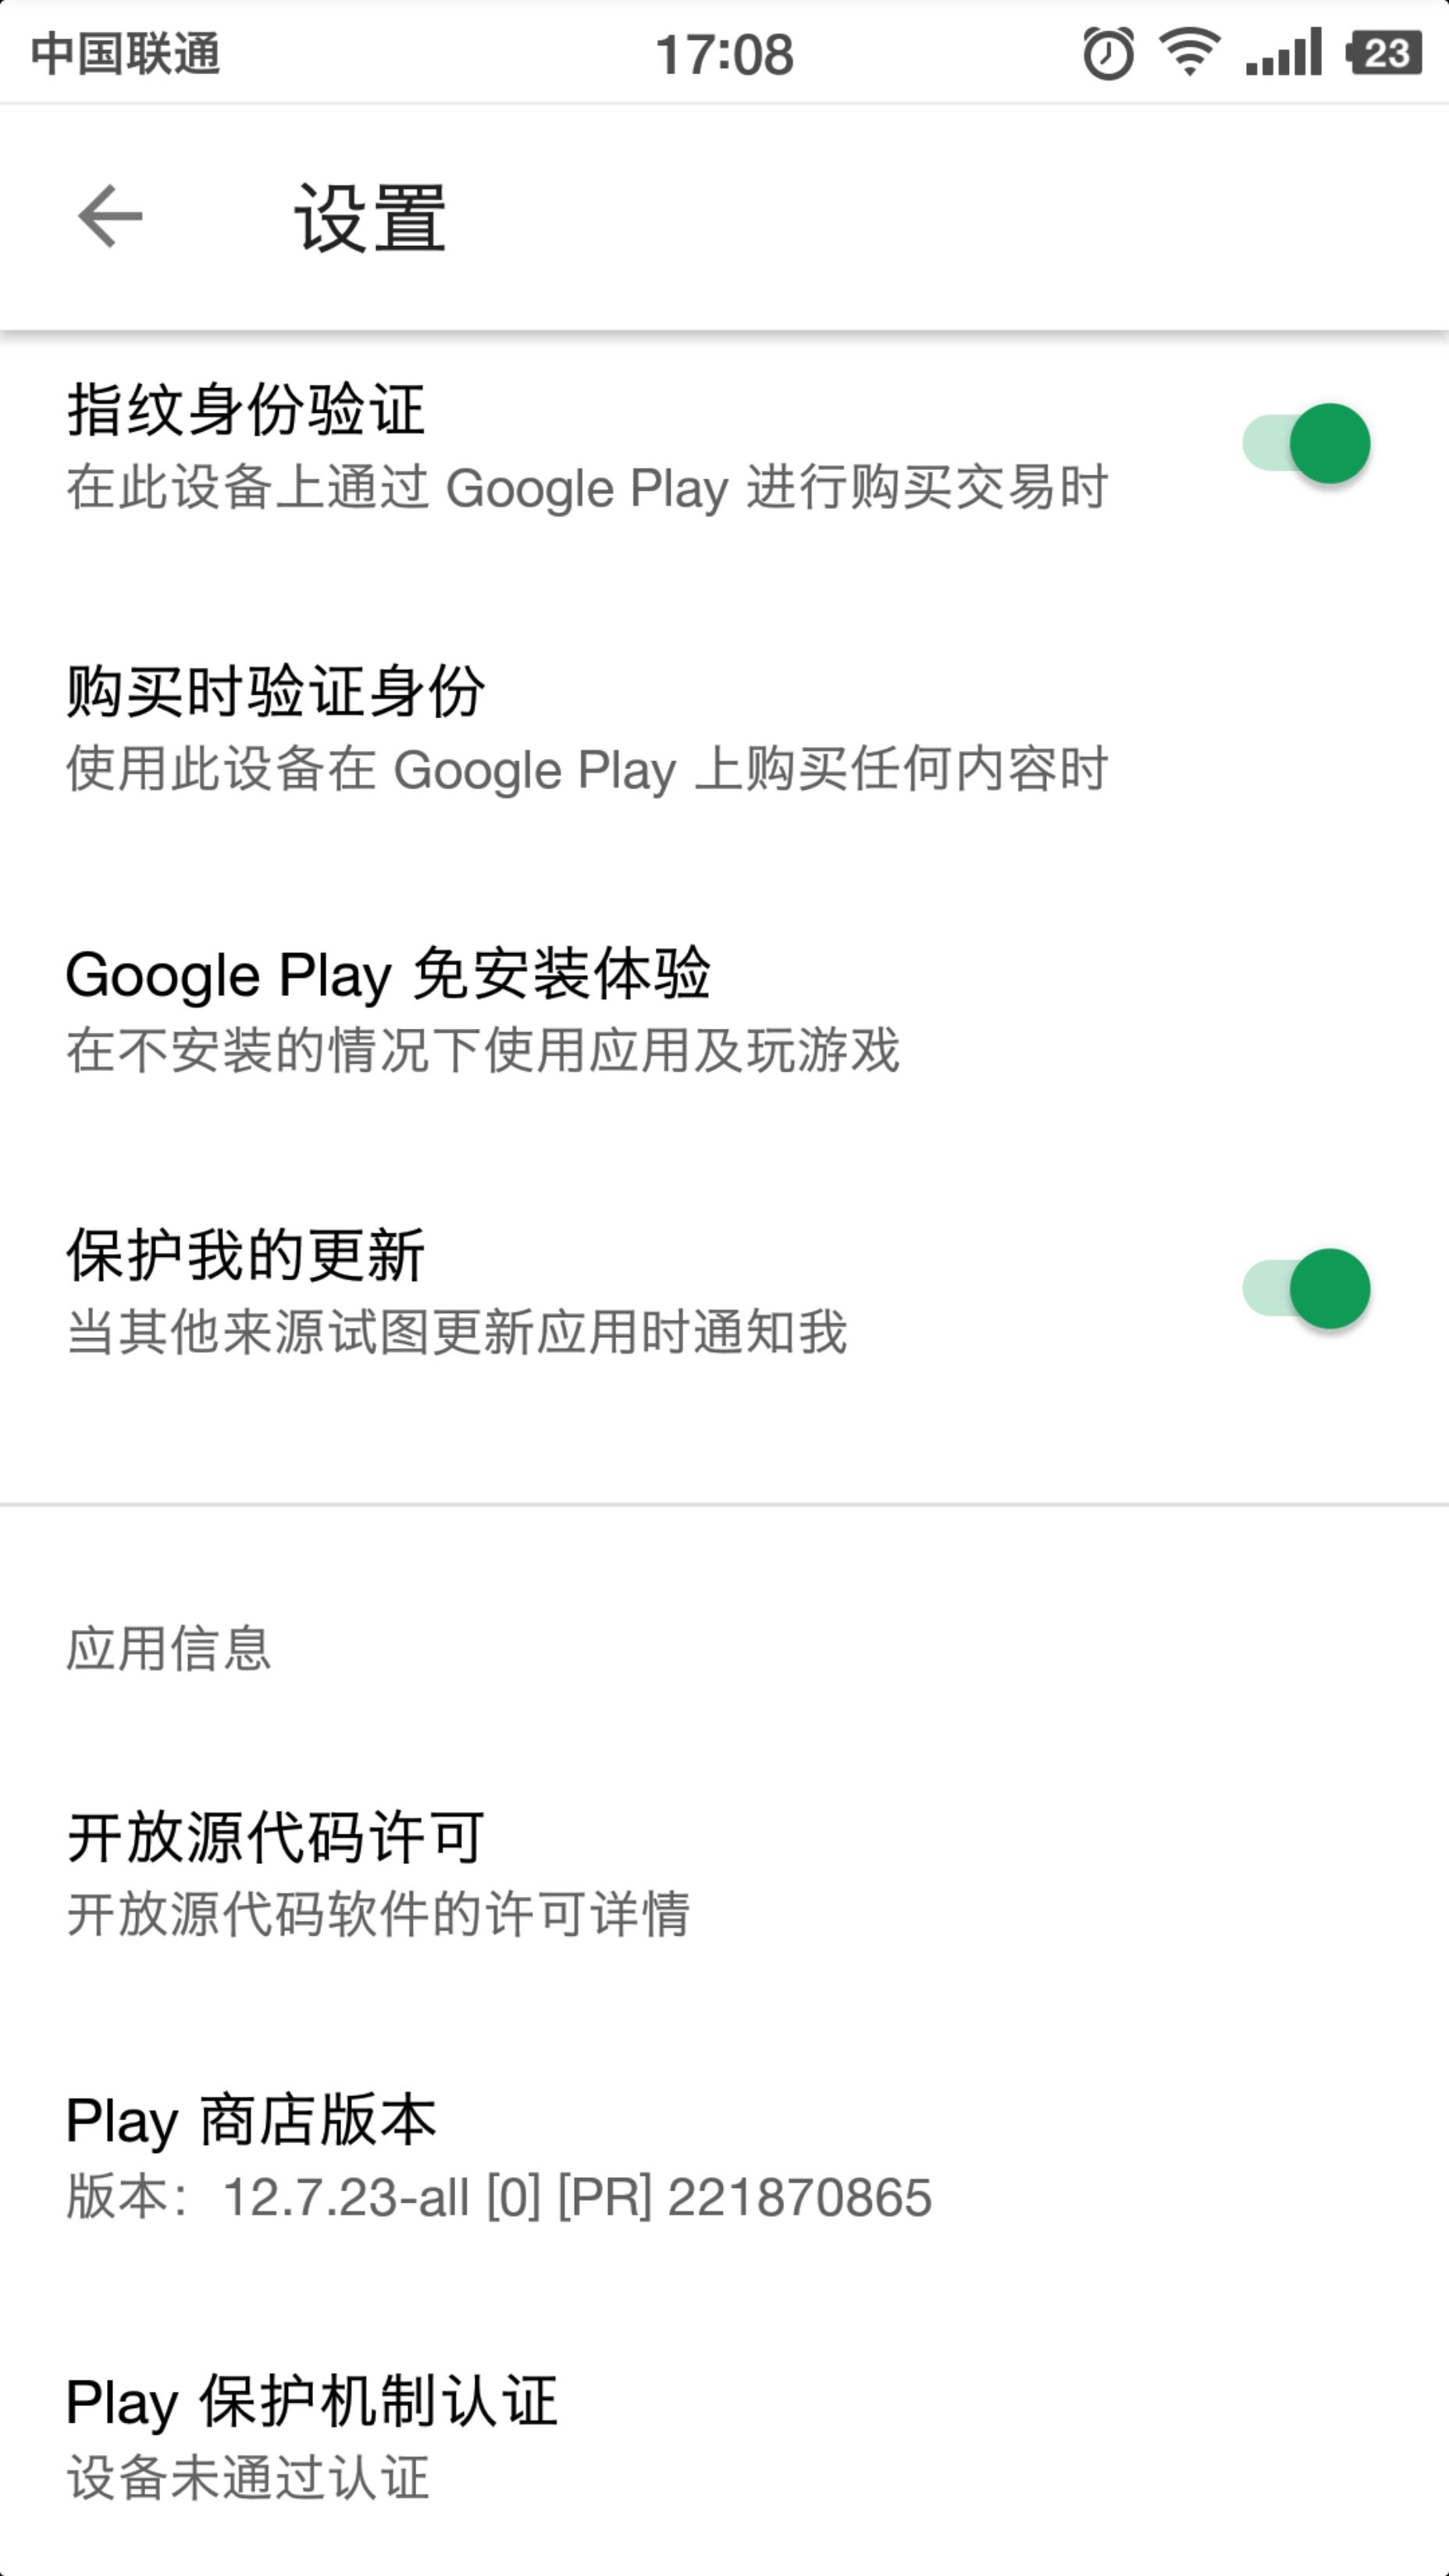 Screenshot_2018-12-06-17-08-55-537_Play ??.png